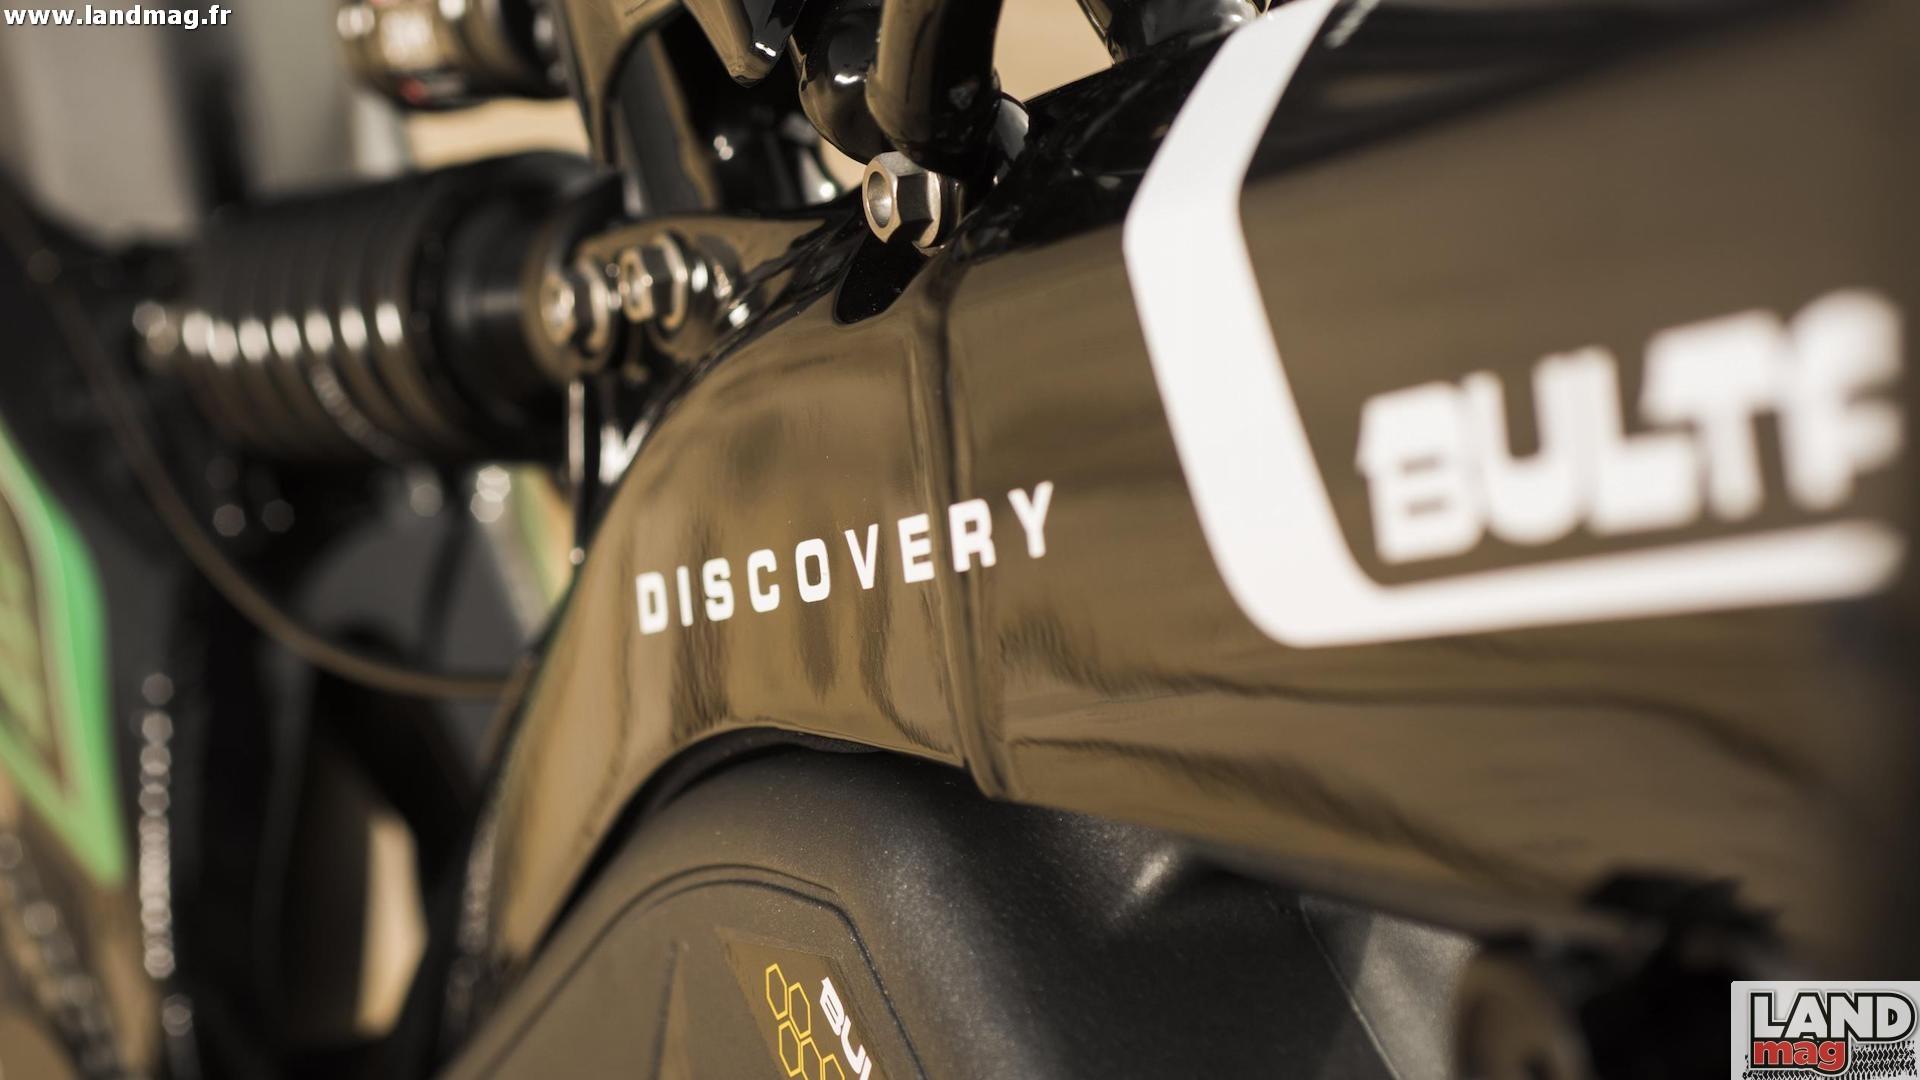 land rover et bultaco cr ent la moto lectrique brinco discovery. Black Bedroom Furniture Sets. Home Design Ideas